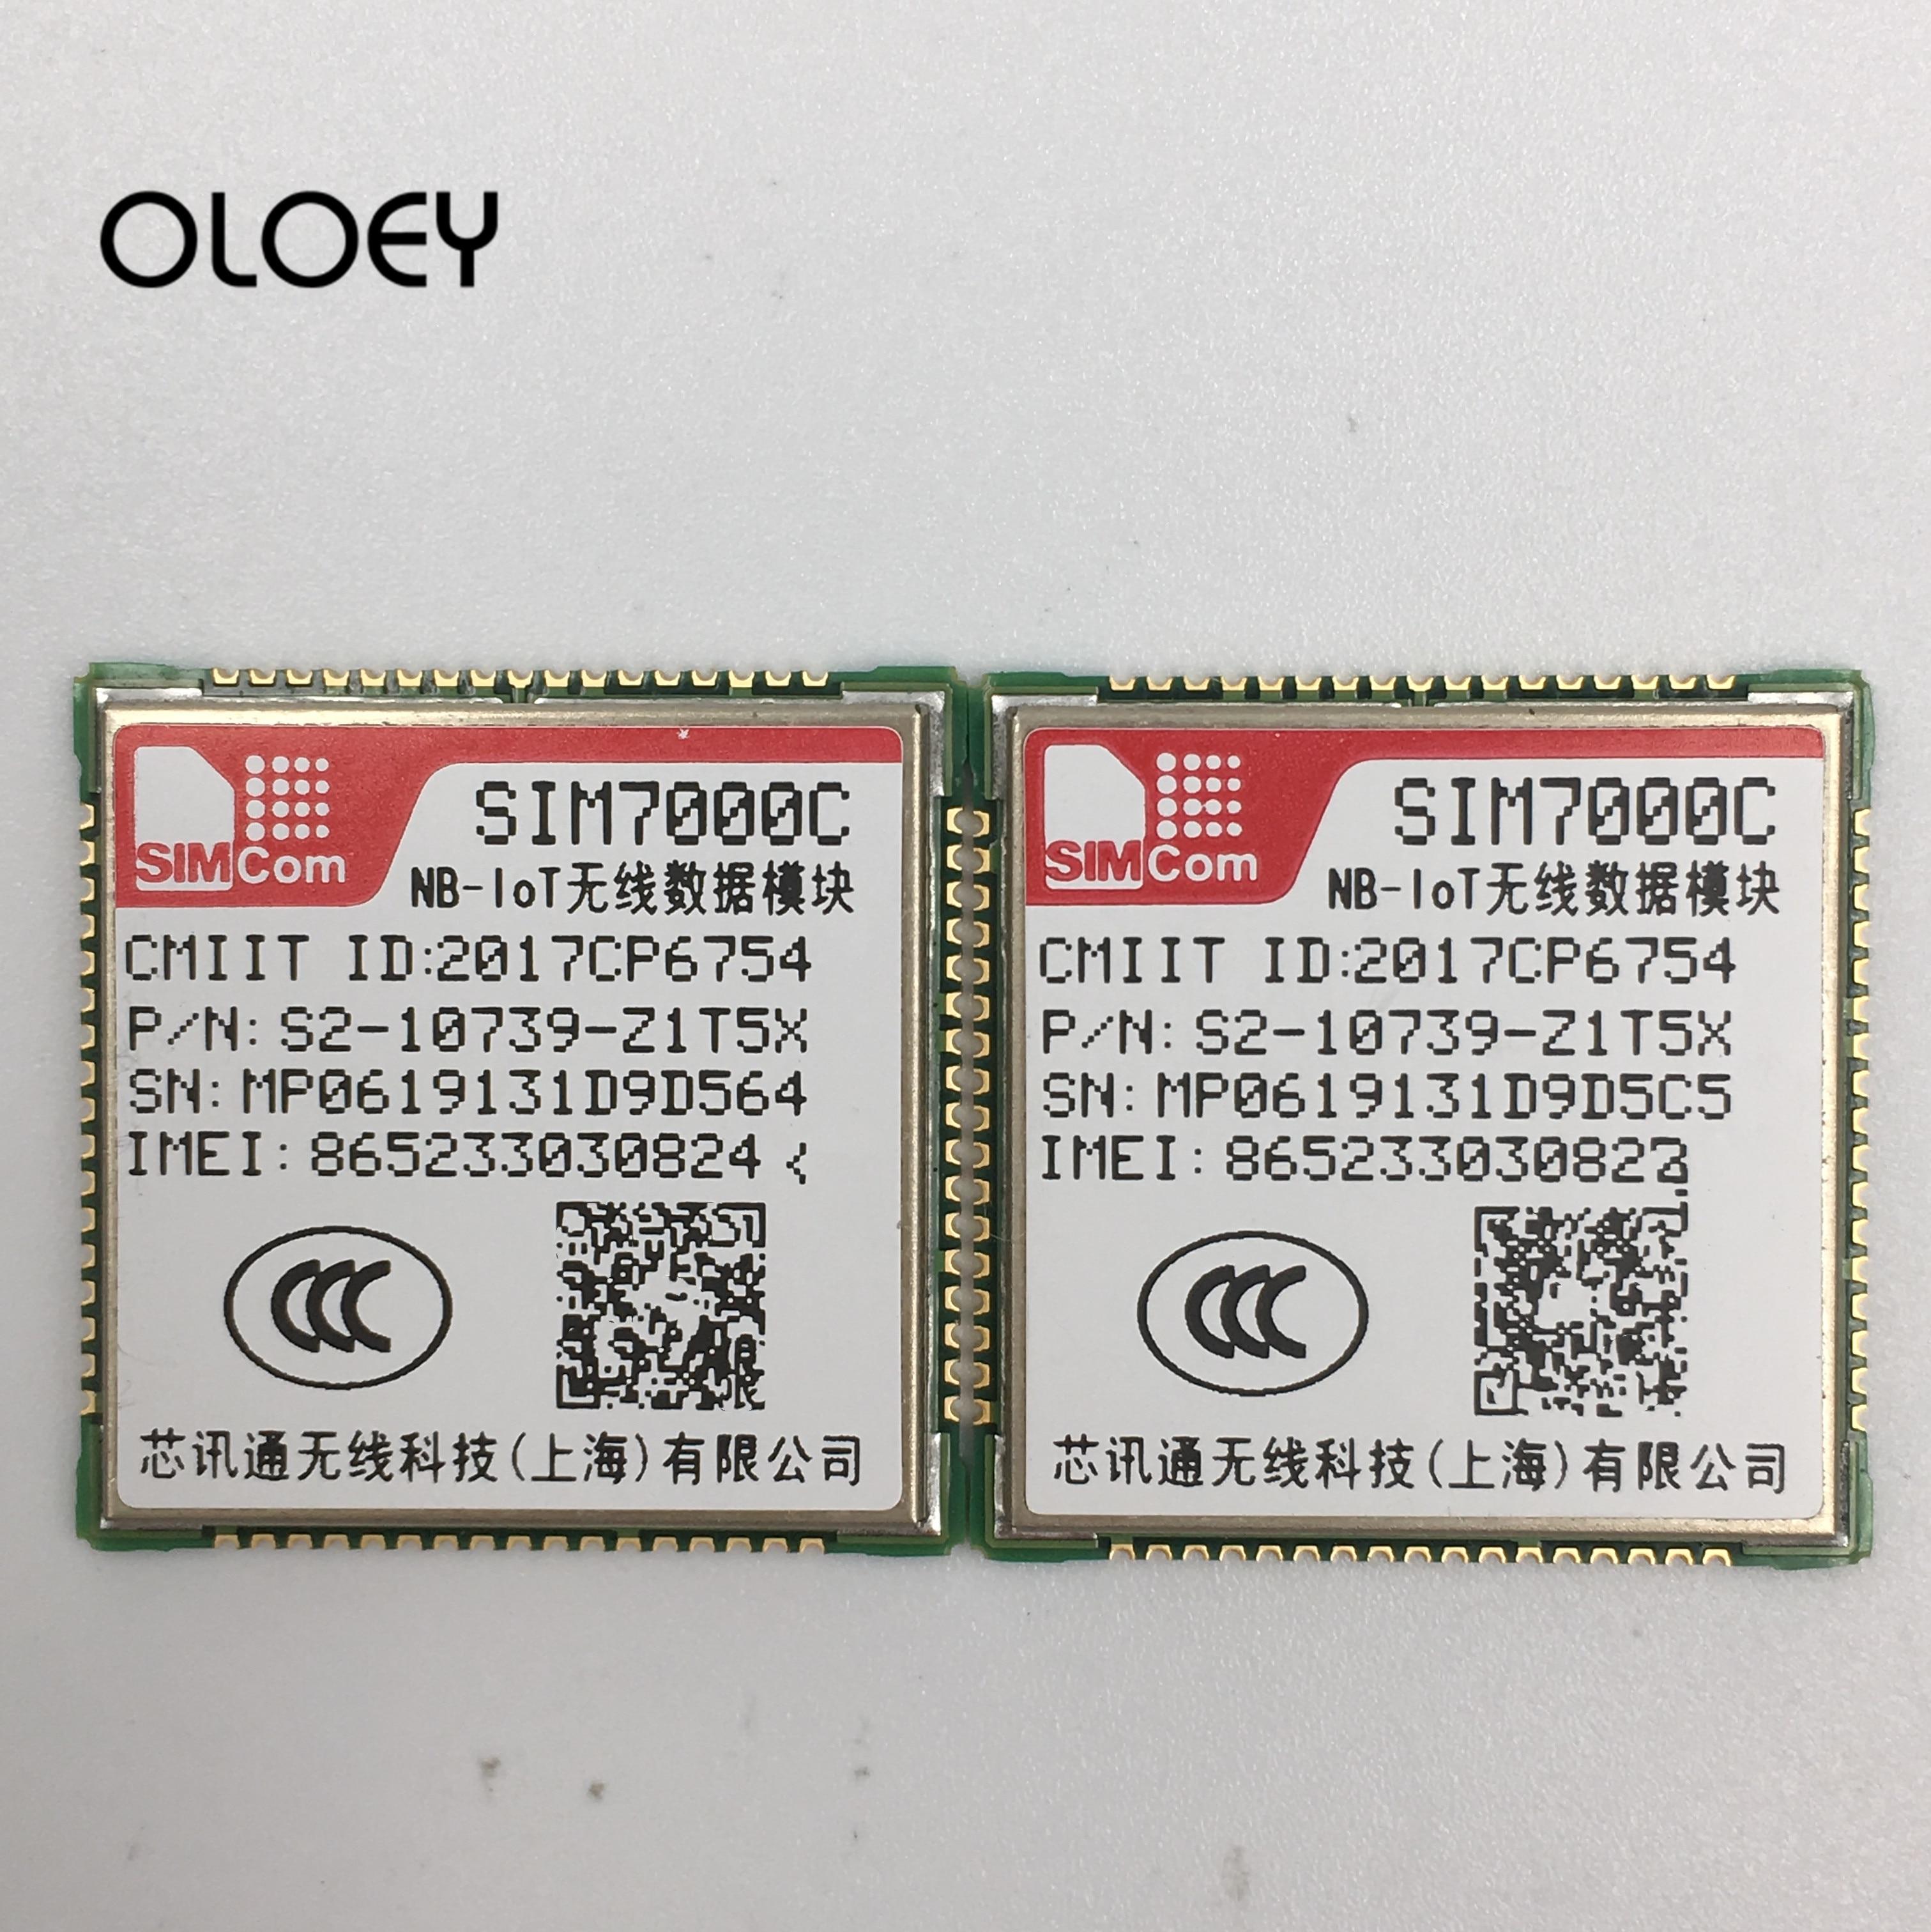 SIMcom SIM7000C LCC  NB-IoT Cat-M1 EMTC Module,100% Brand New Original